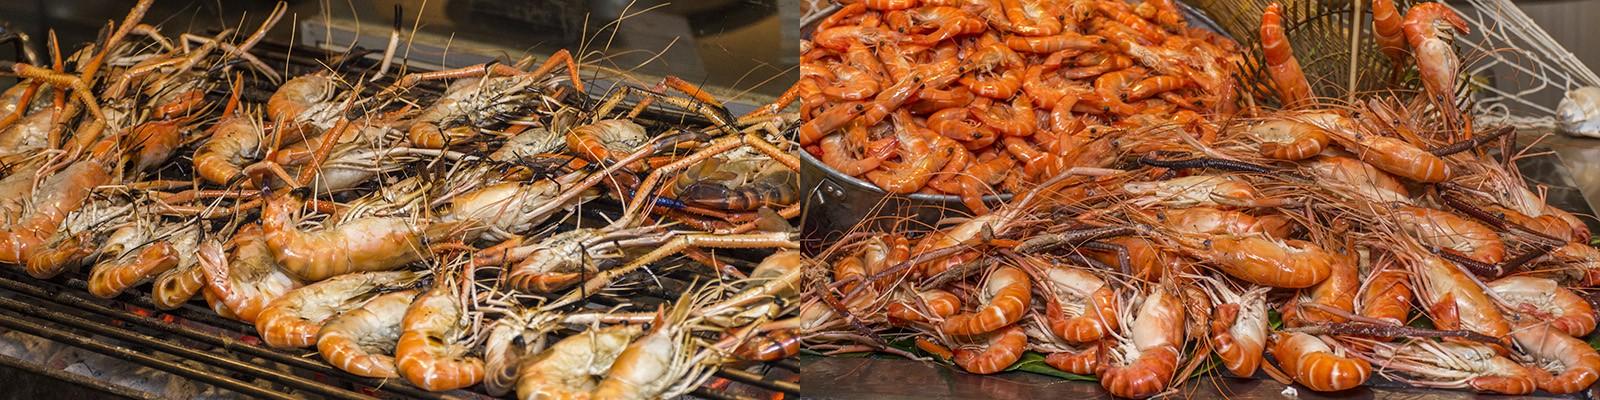 river prawn buffet promotion